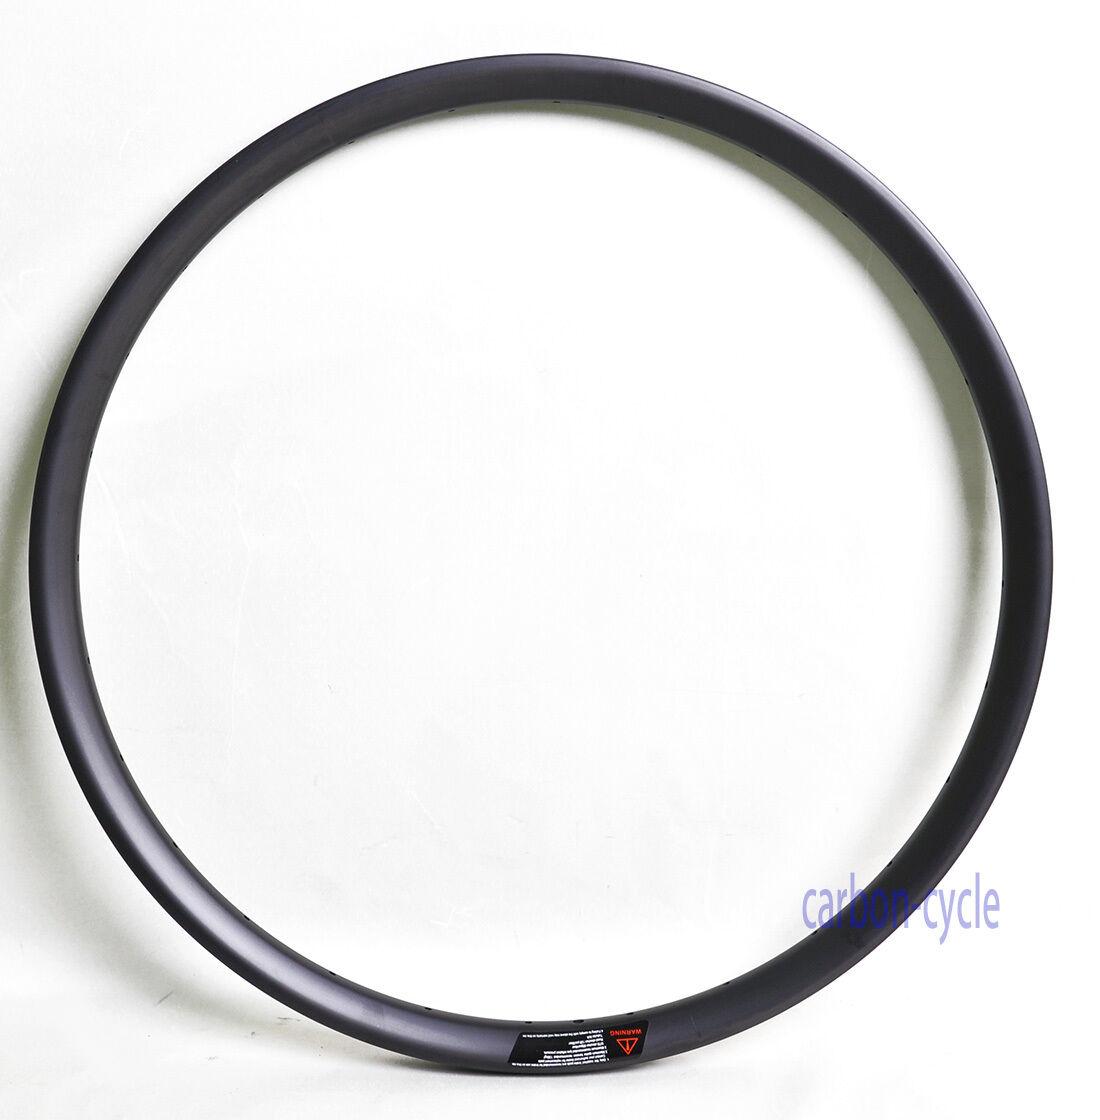 27.5er MTB Wheel Carbon Clincher Rim 35mm UD Matt 28h Tubeless Mountain